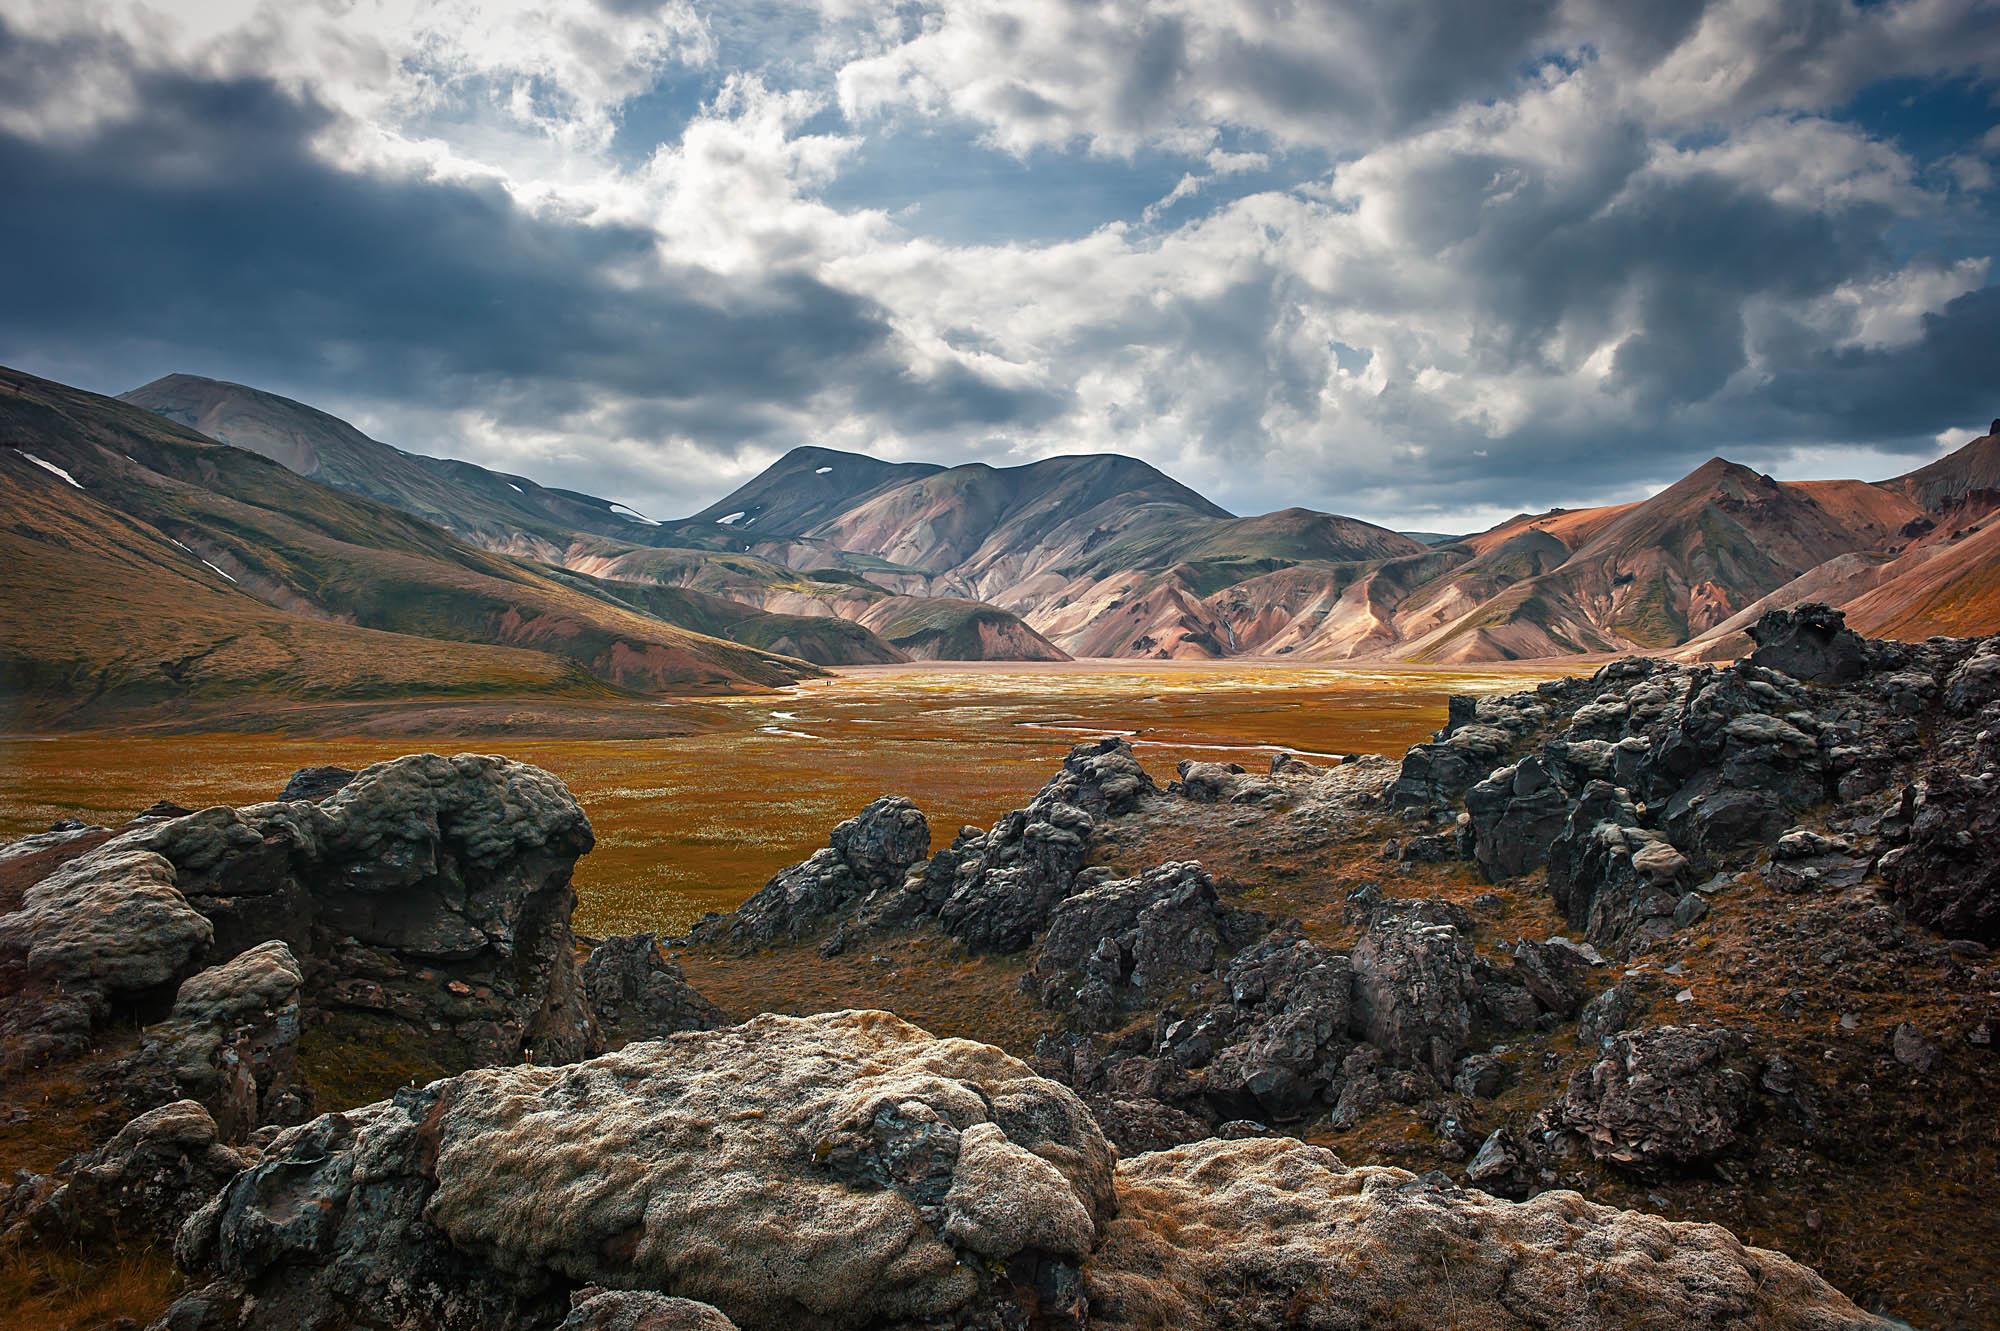 landmannalaugar tour from reykjavik